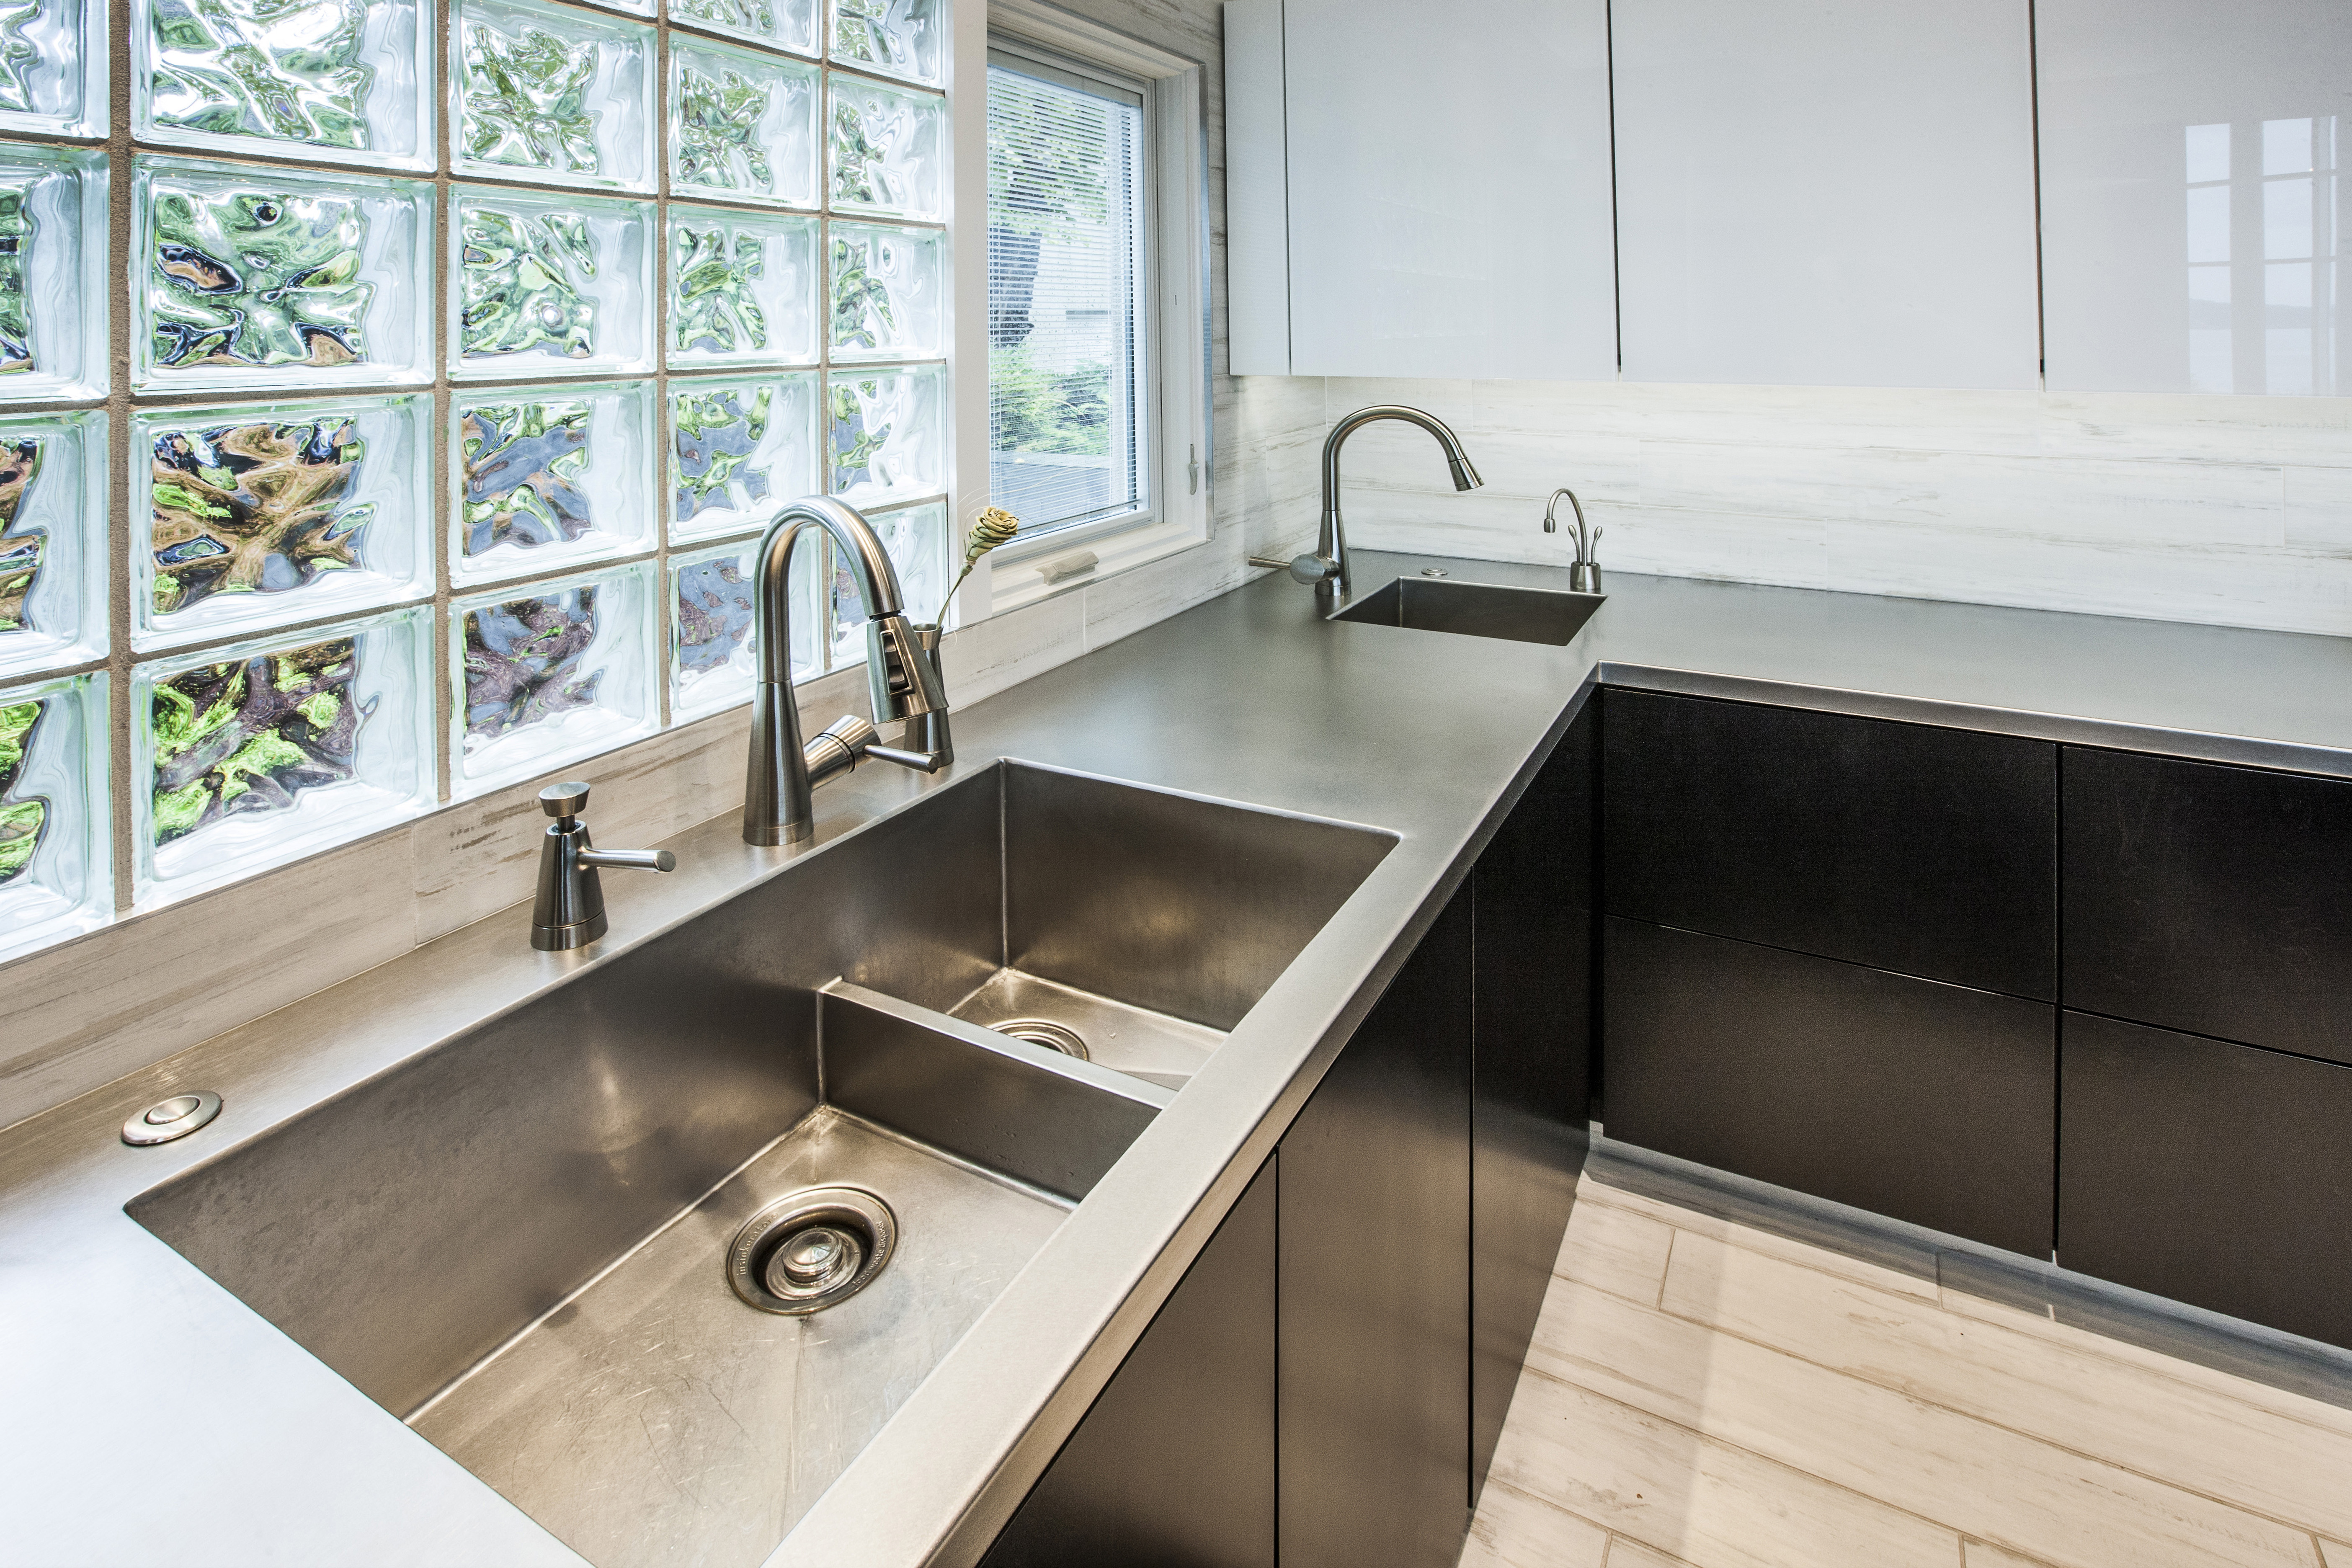 Custom Zinc Kitchen Sink - Rustica House ®